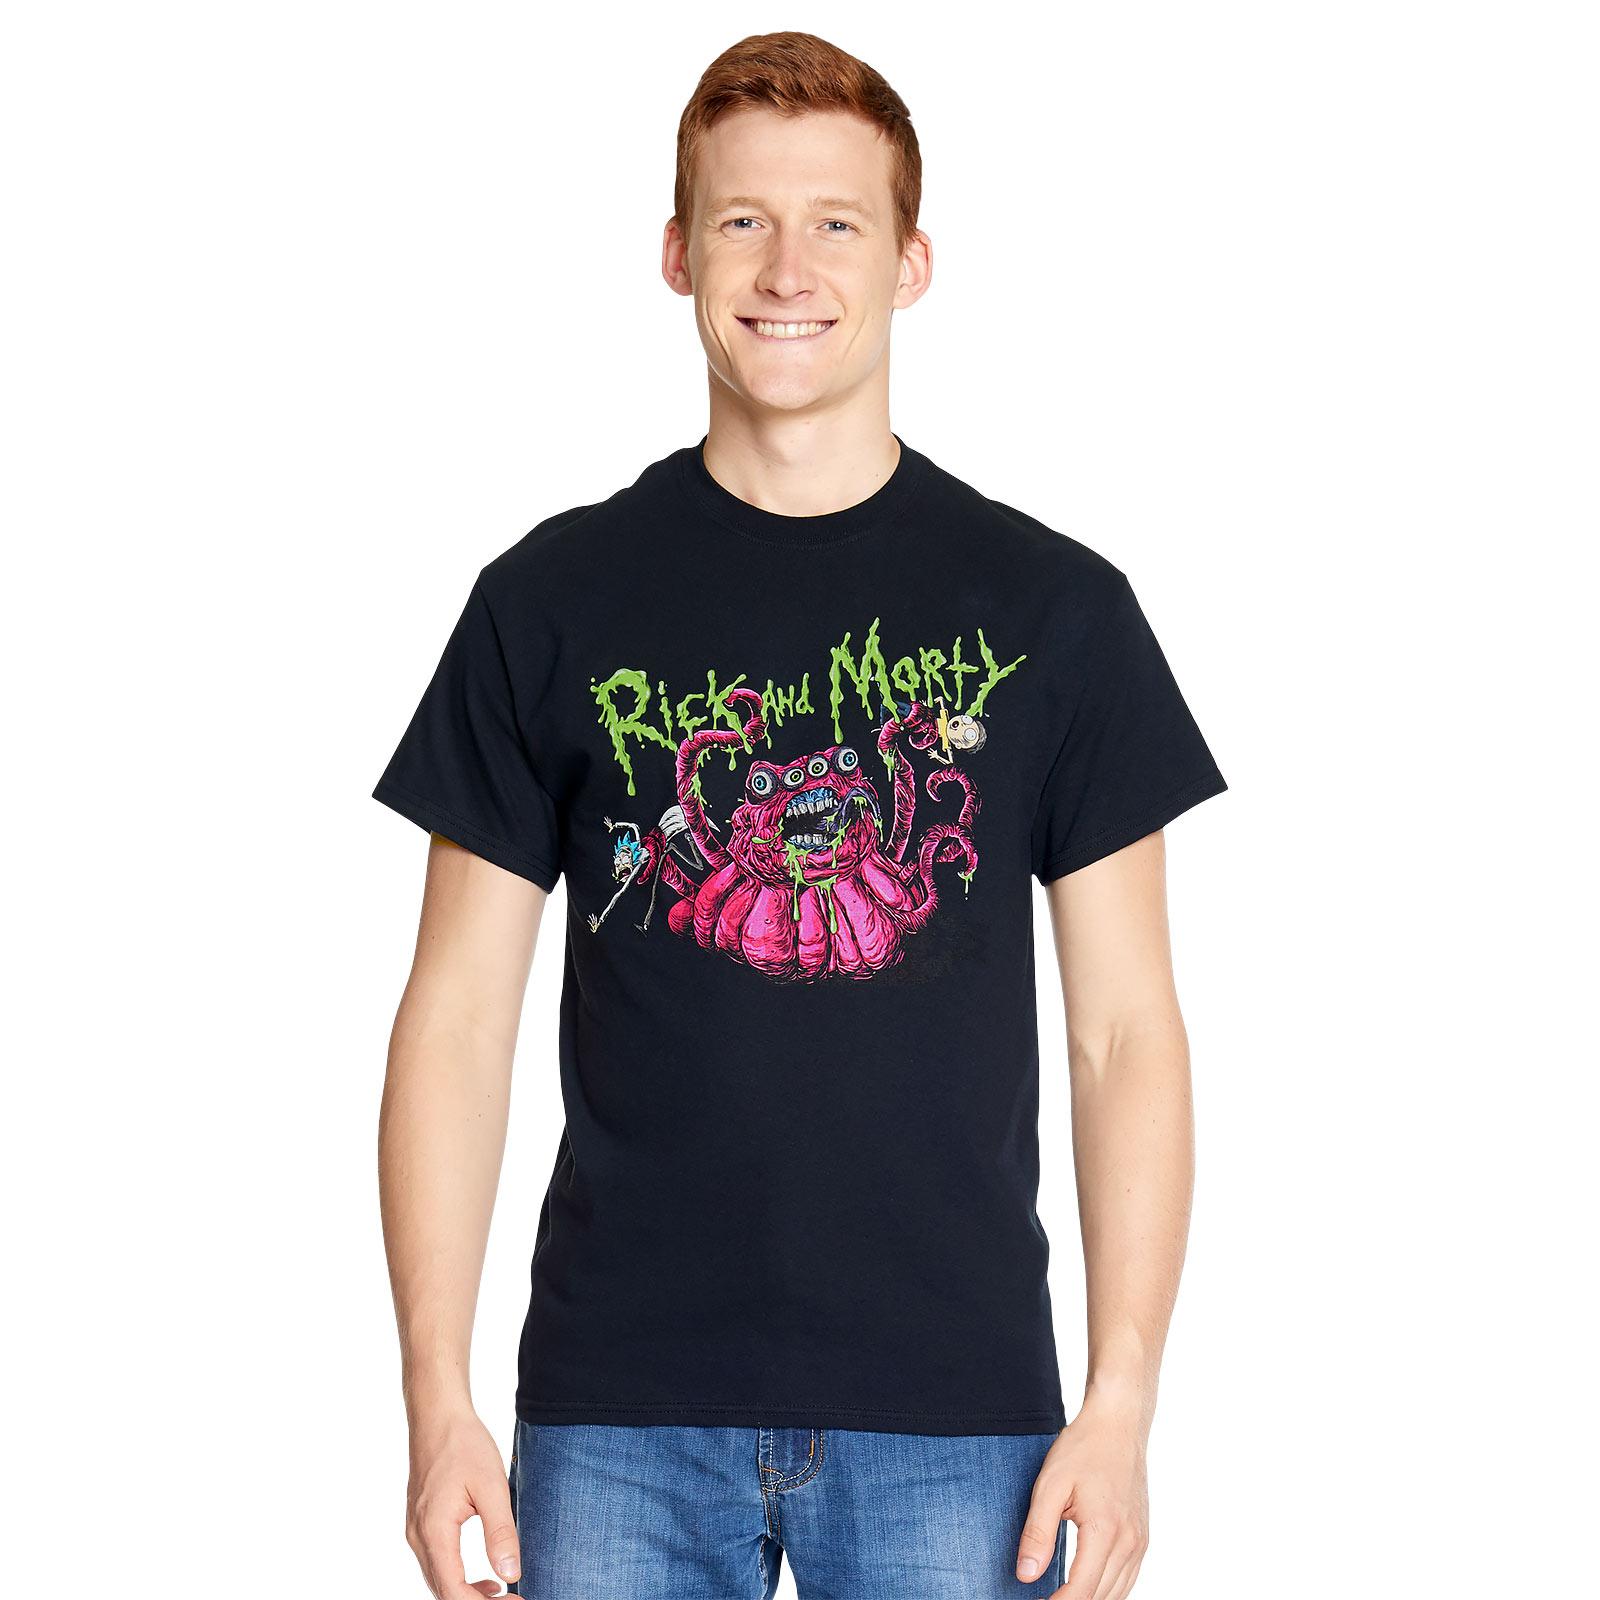 Rick and Morty - Monster Slime T-Shirt schwarz